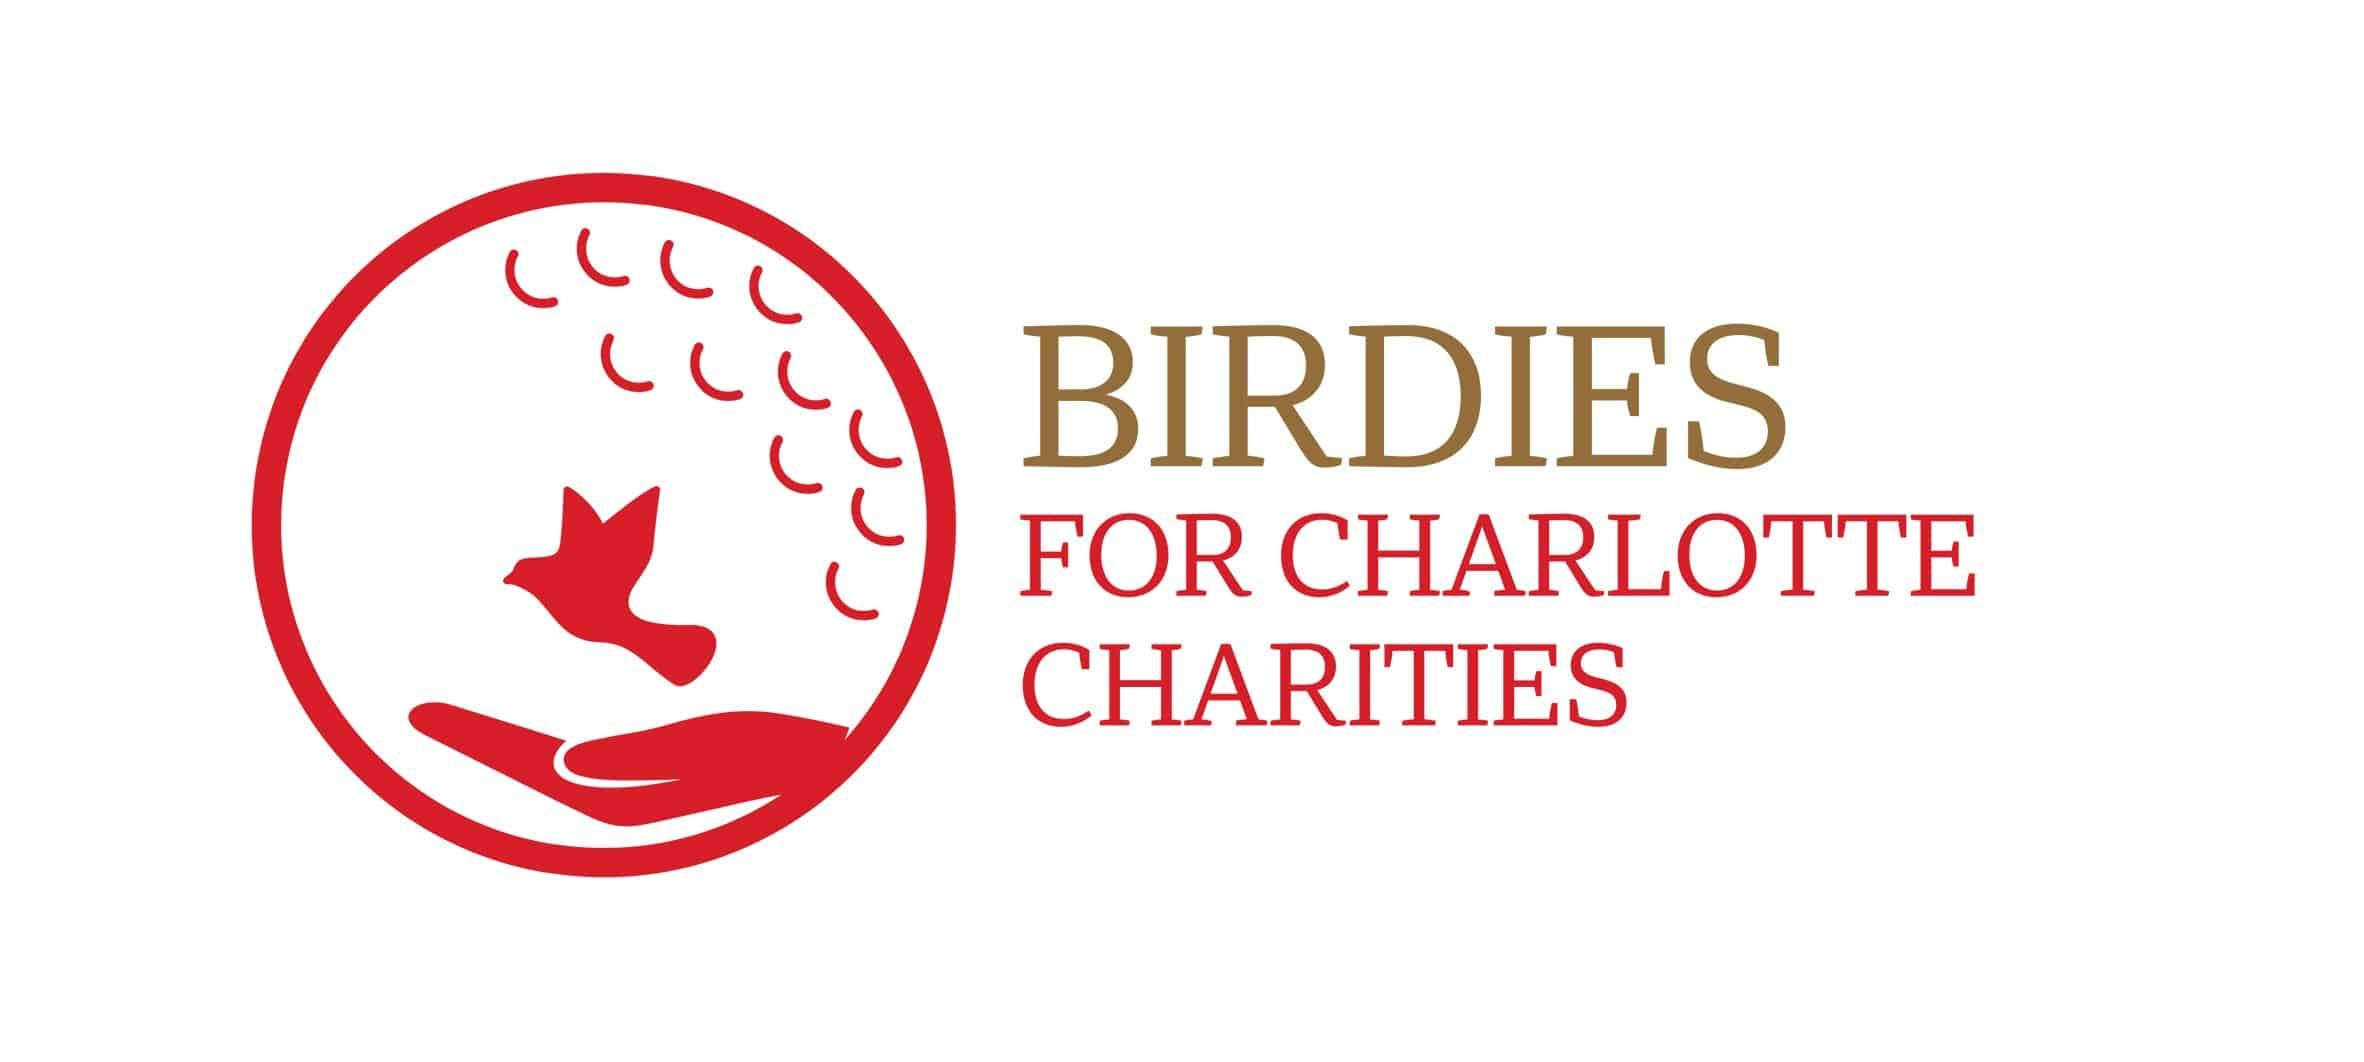 Birdies for Charlotte Charities